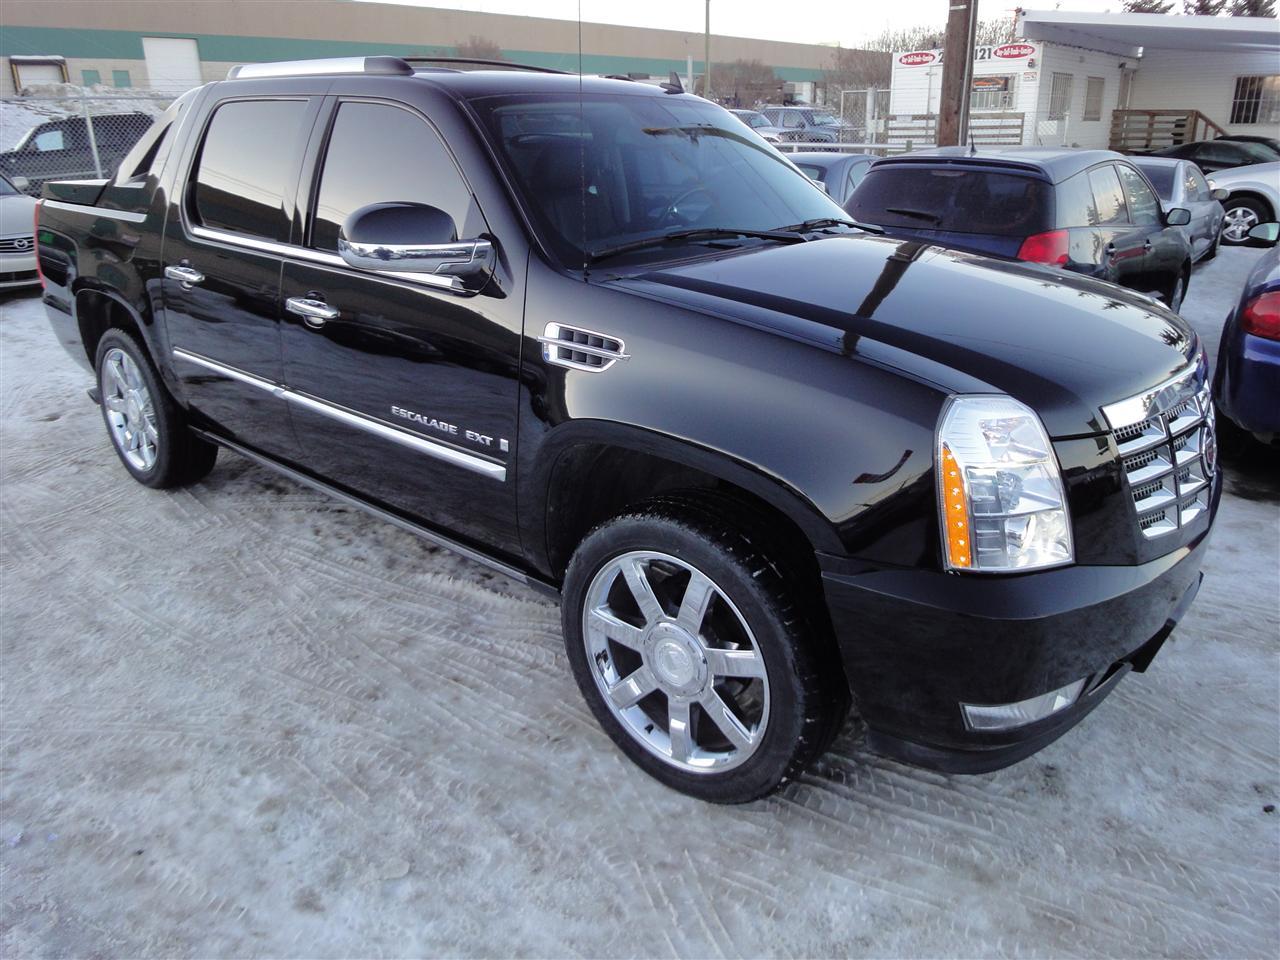 2008 Cadillac Escalade EXT Ultra Luxury Pkg - Envision Auto